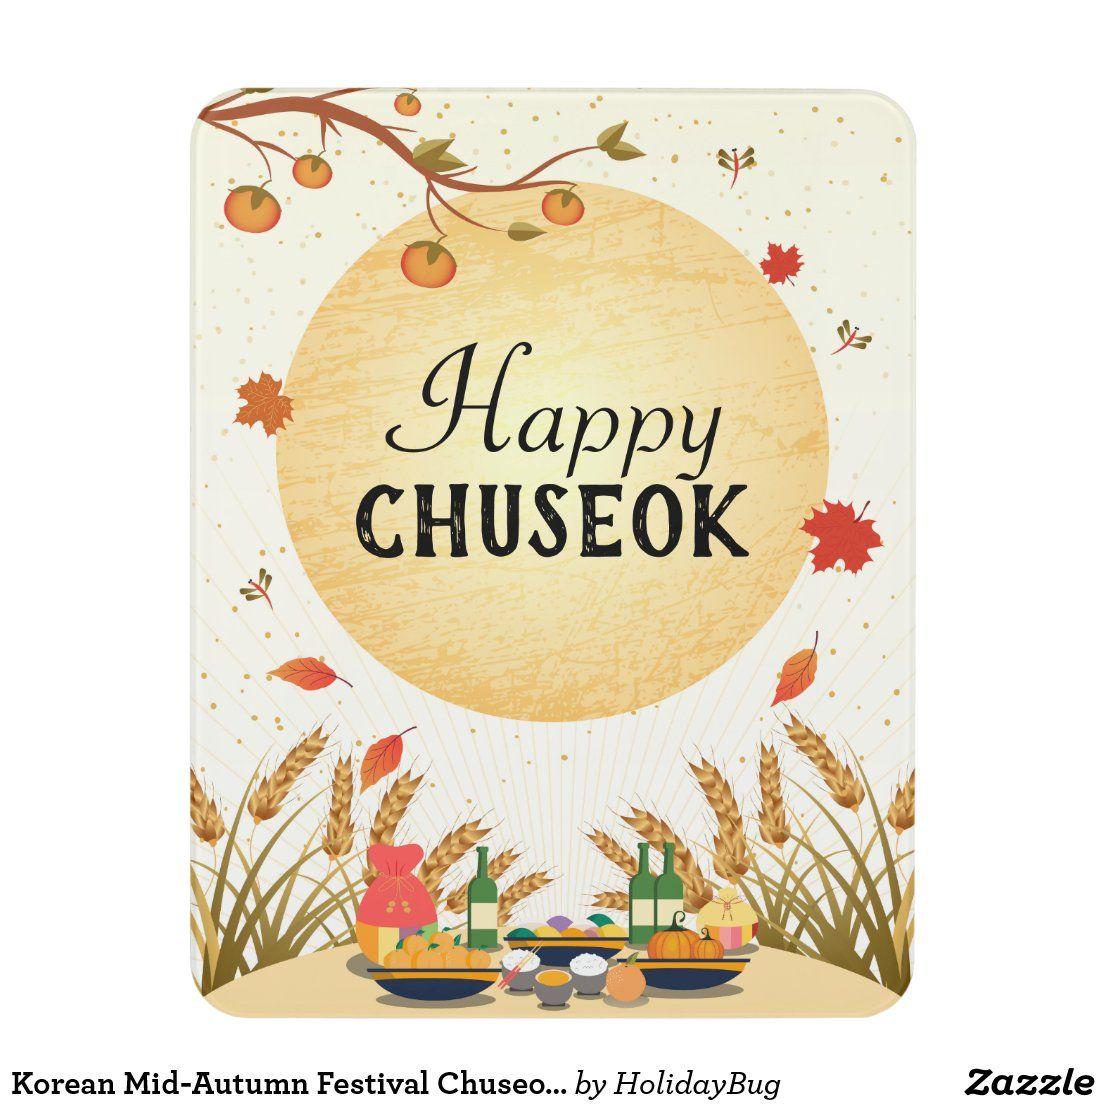 Korean Mid Autumn Festival Chuseok Picnic Door Sign Zazzle Com In 2020 Mid Autumn Festival Mid Autumn Fall Festival